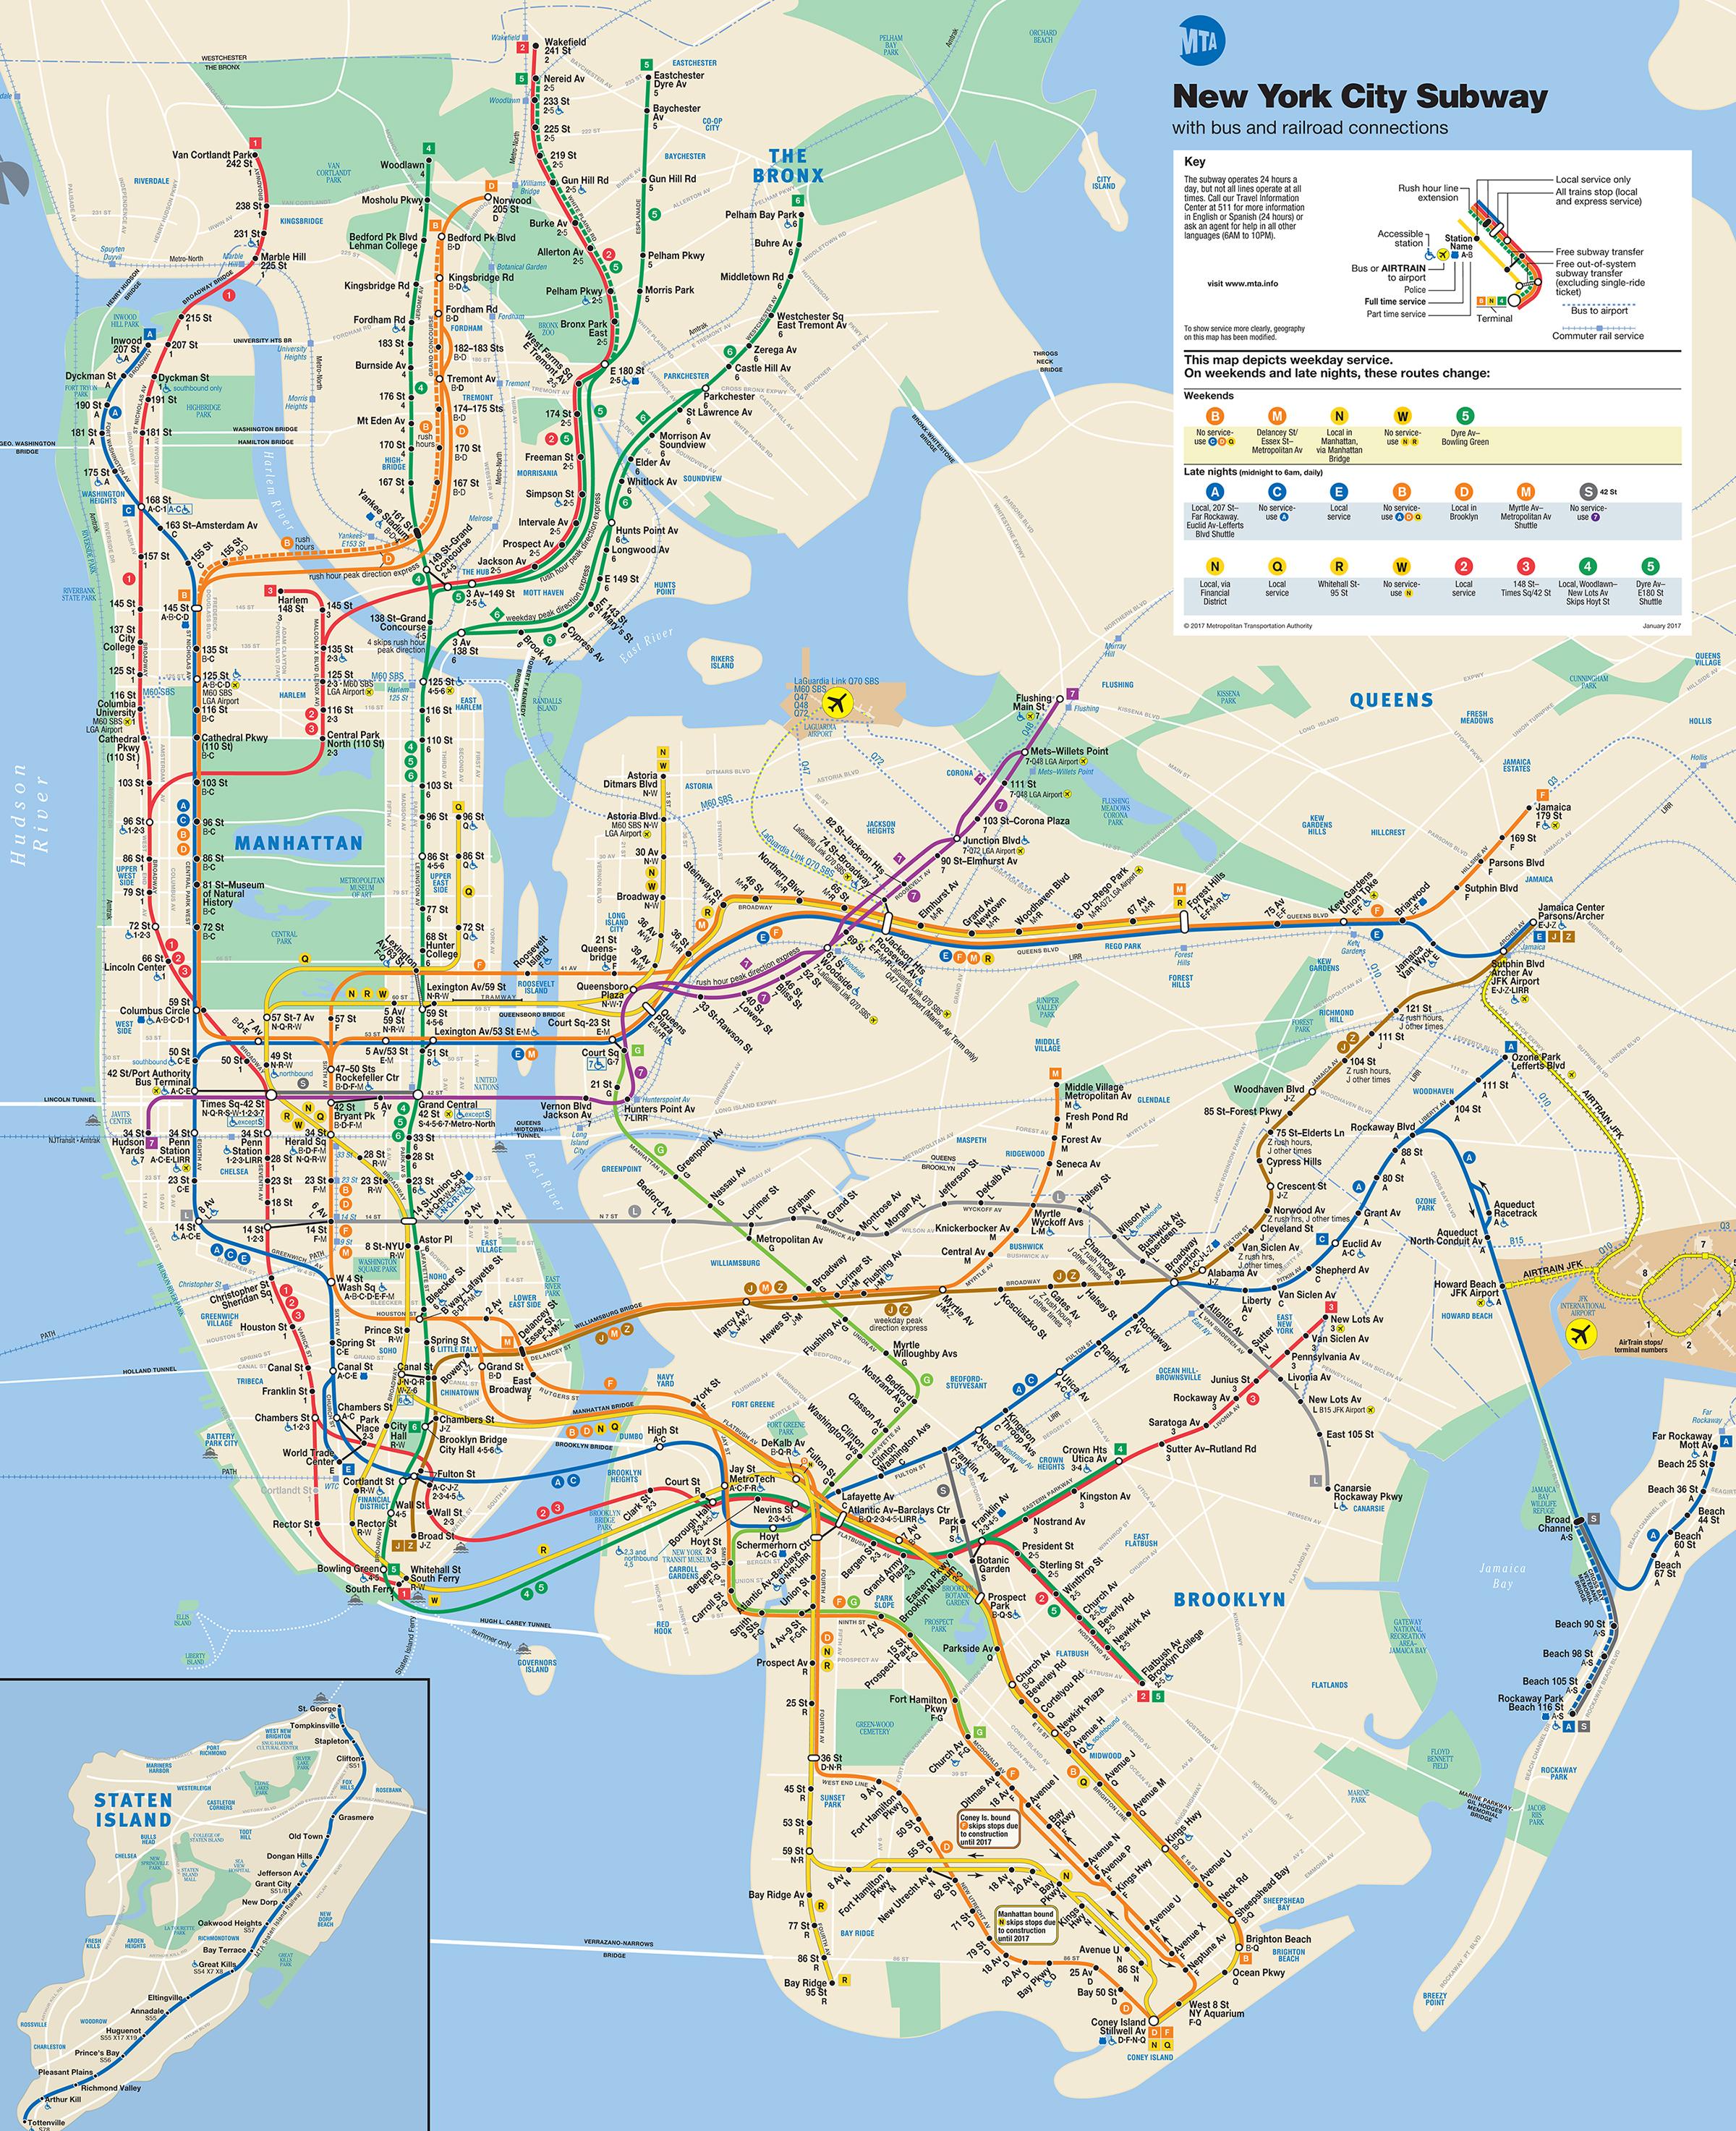 http://web.mta.info/maps/submap.html